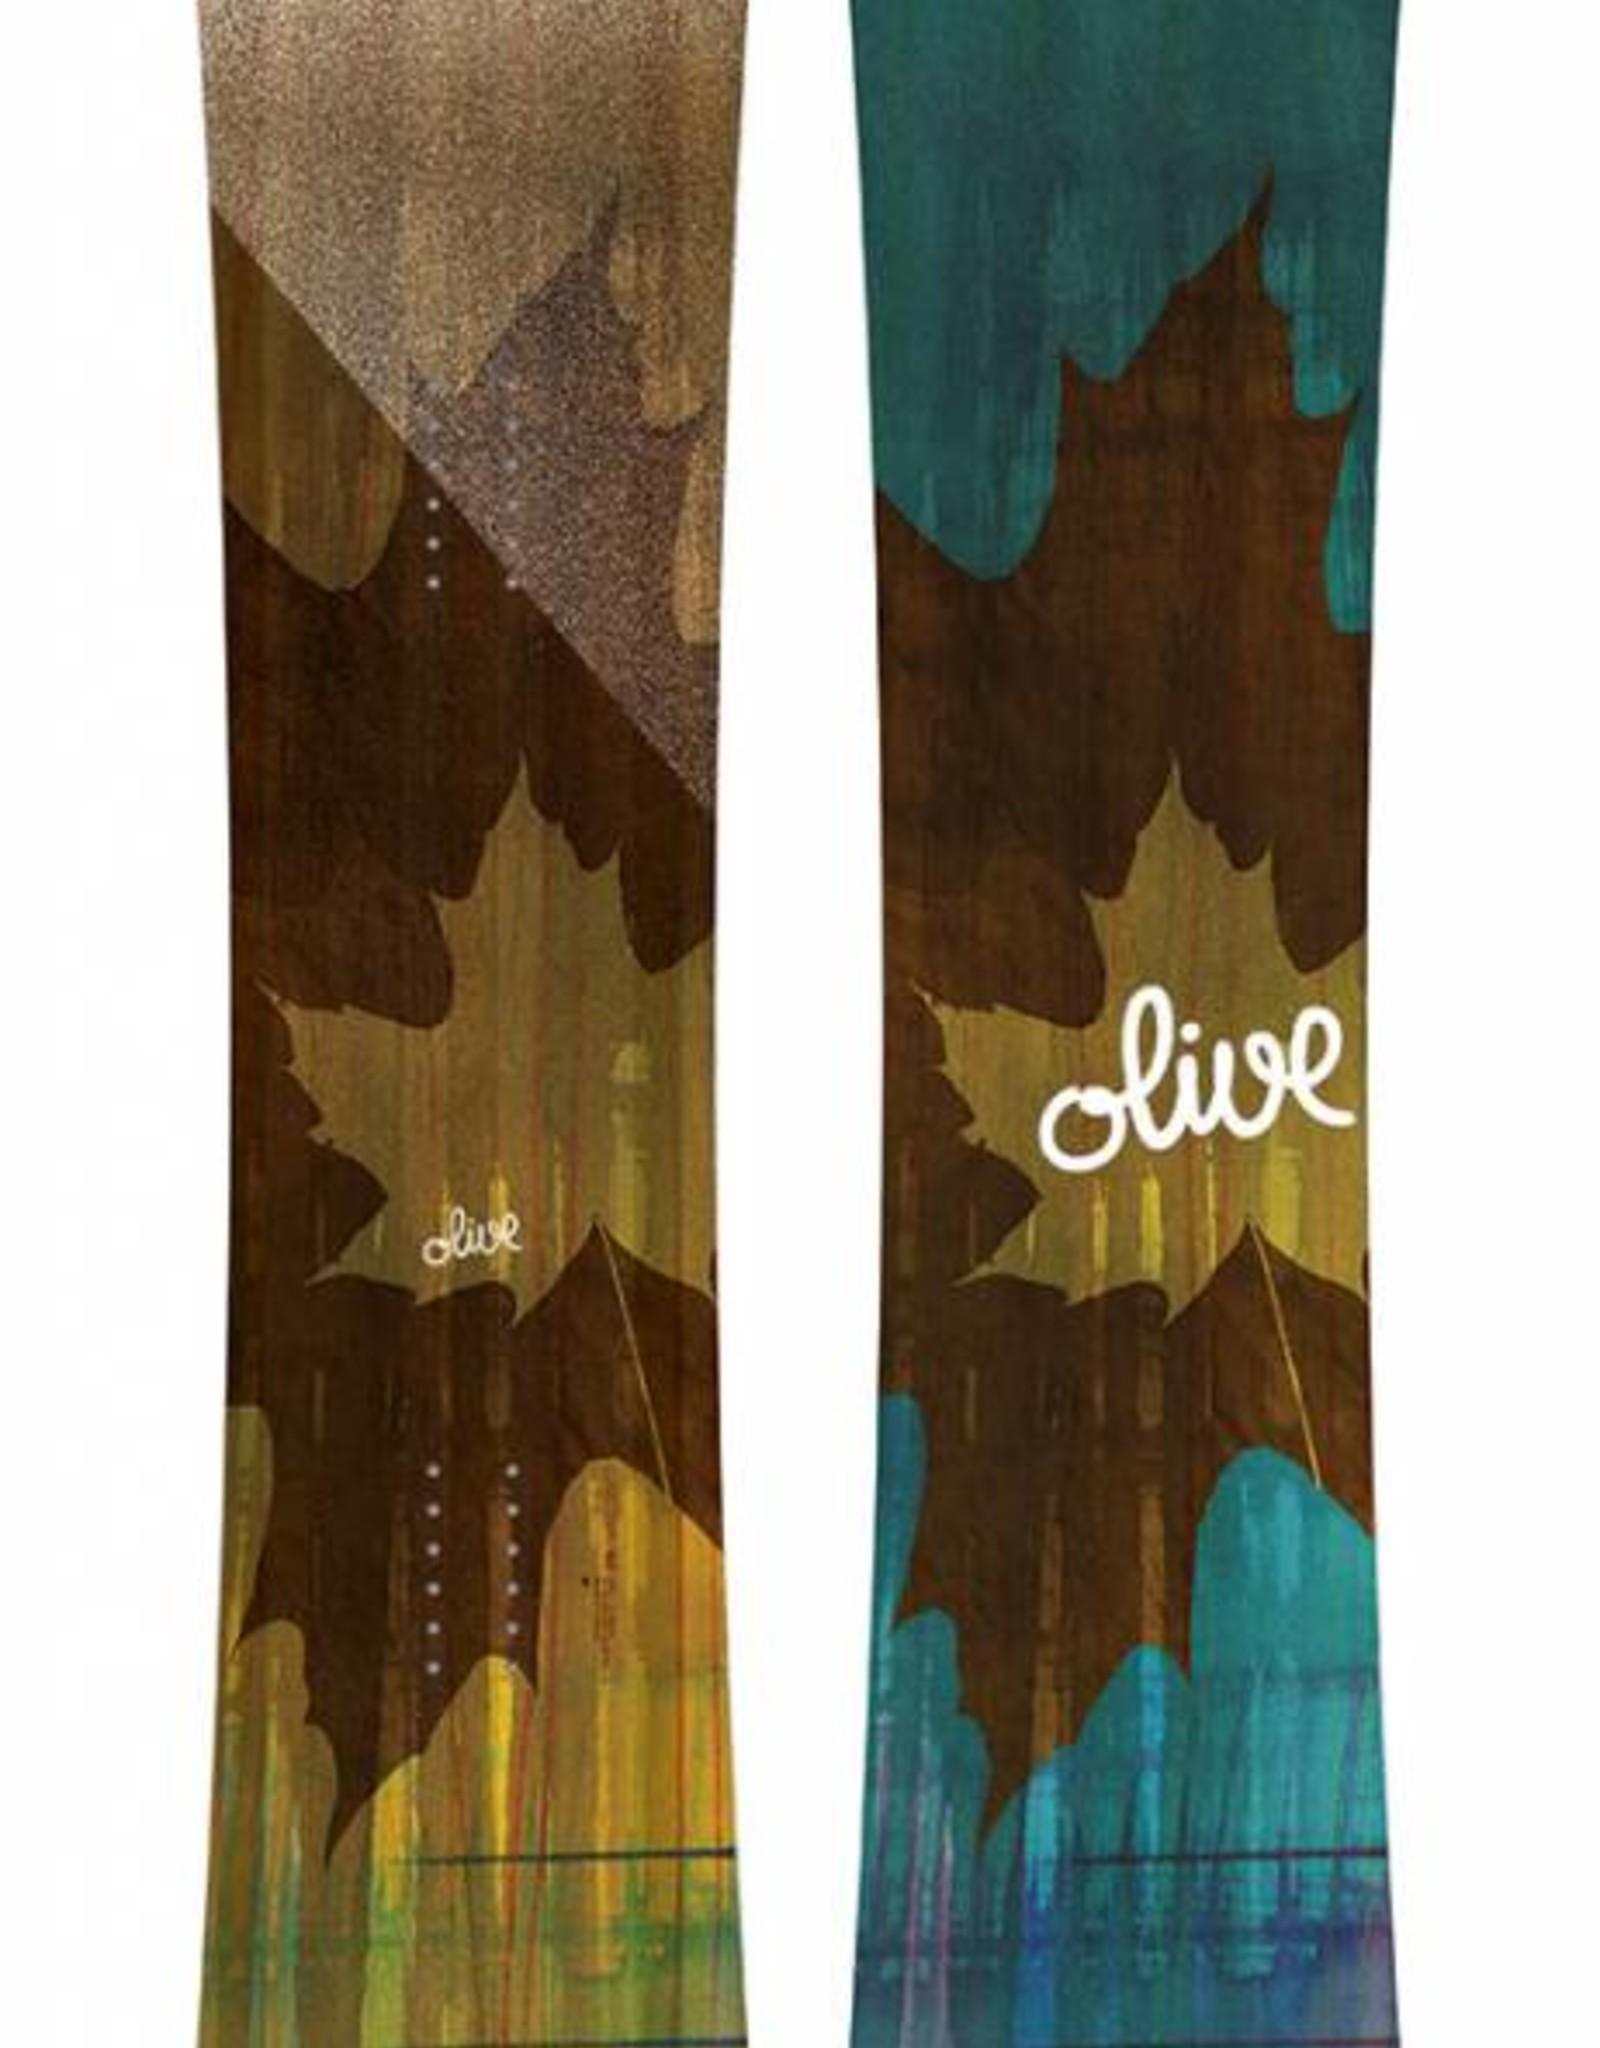 OLIVE Olive - TWIN LOGO (2019) - 154cm